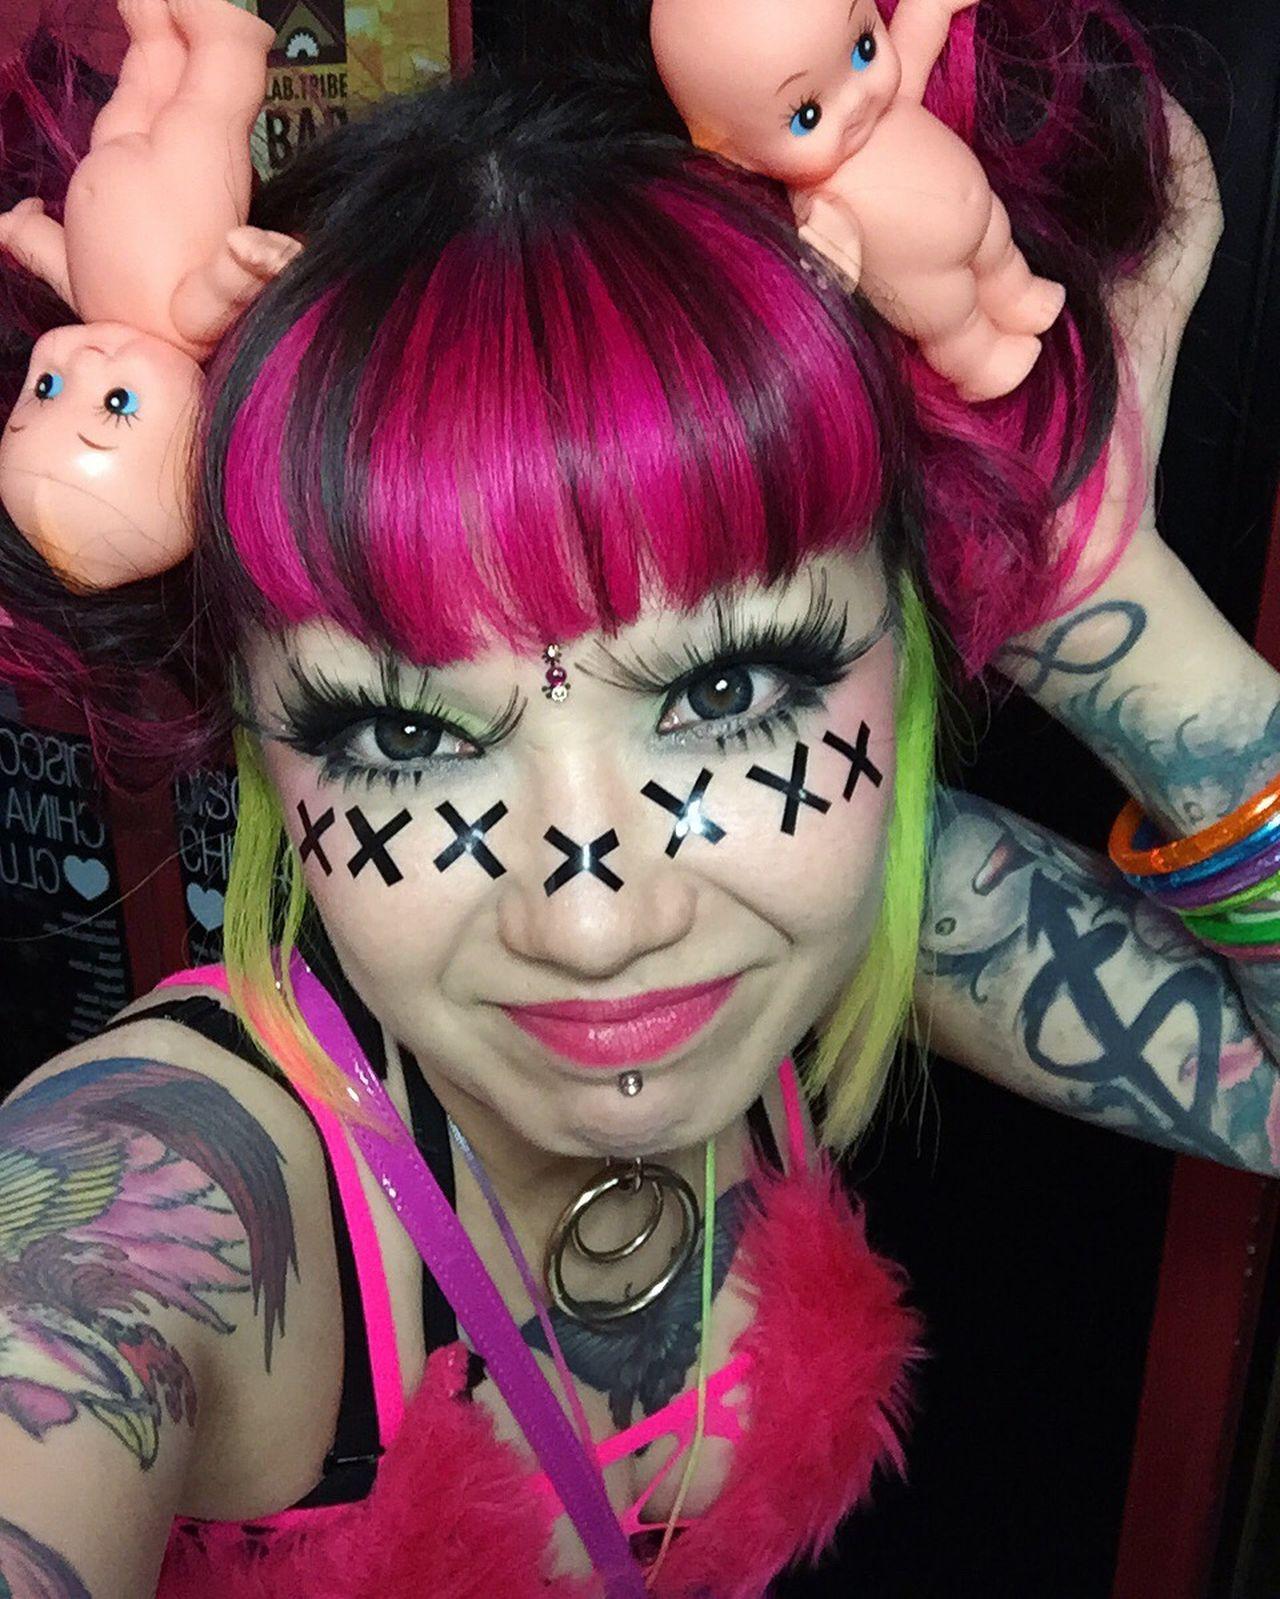 Pink Pinkhair Manicpanic Kewpiedoll Kewpie Doll Dolls Puppet Puppe ThatsMe Self Portrait Selfie ✌ Eyelashes Makeup Cross Tattoo Tattoos Bindi Pigtails  Feierabend Party Fetish Mixed Girl Mixed Girl